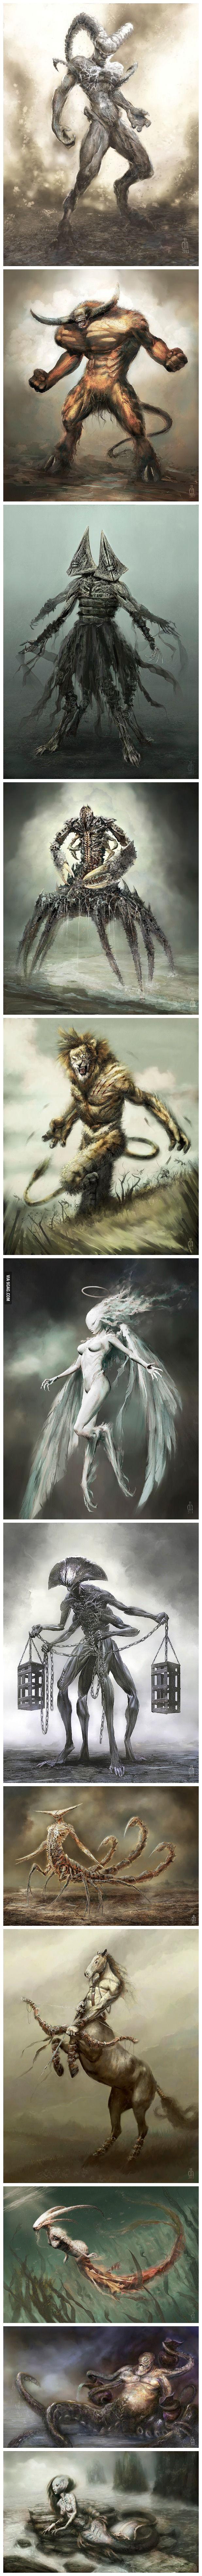 The Zodiac Beasts